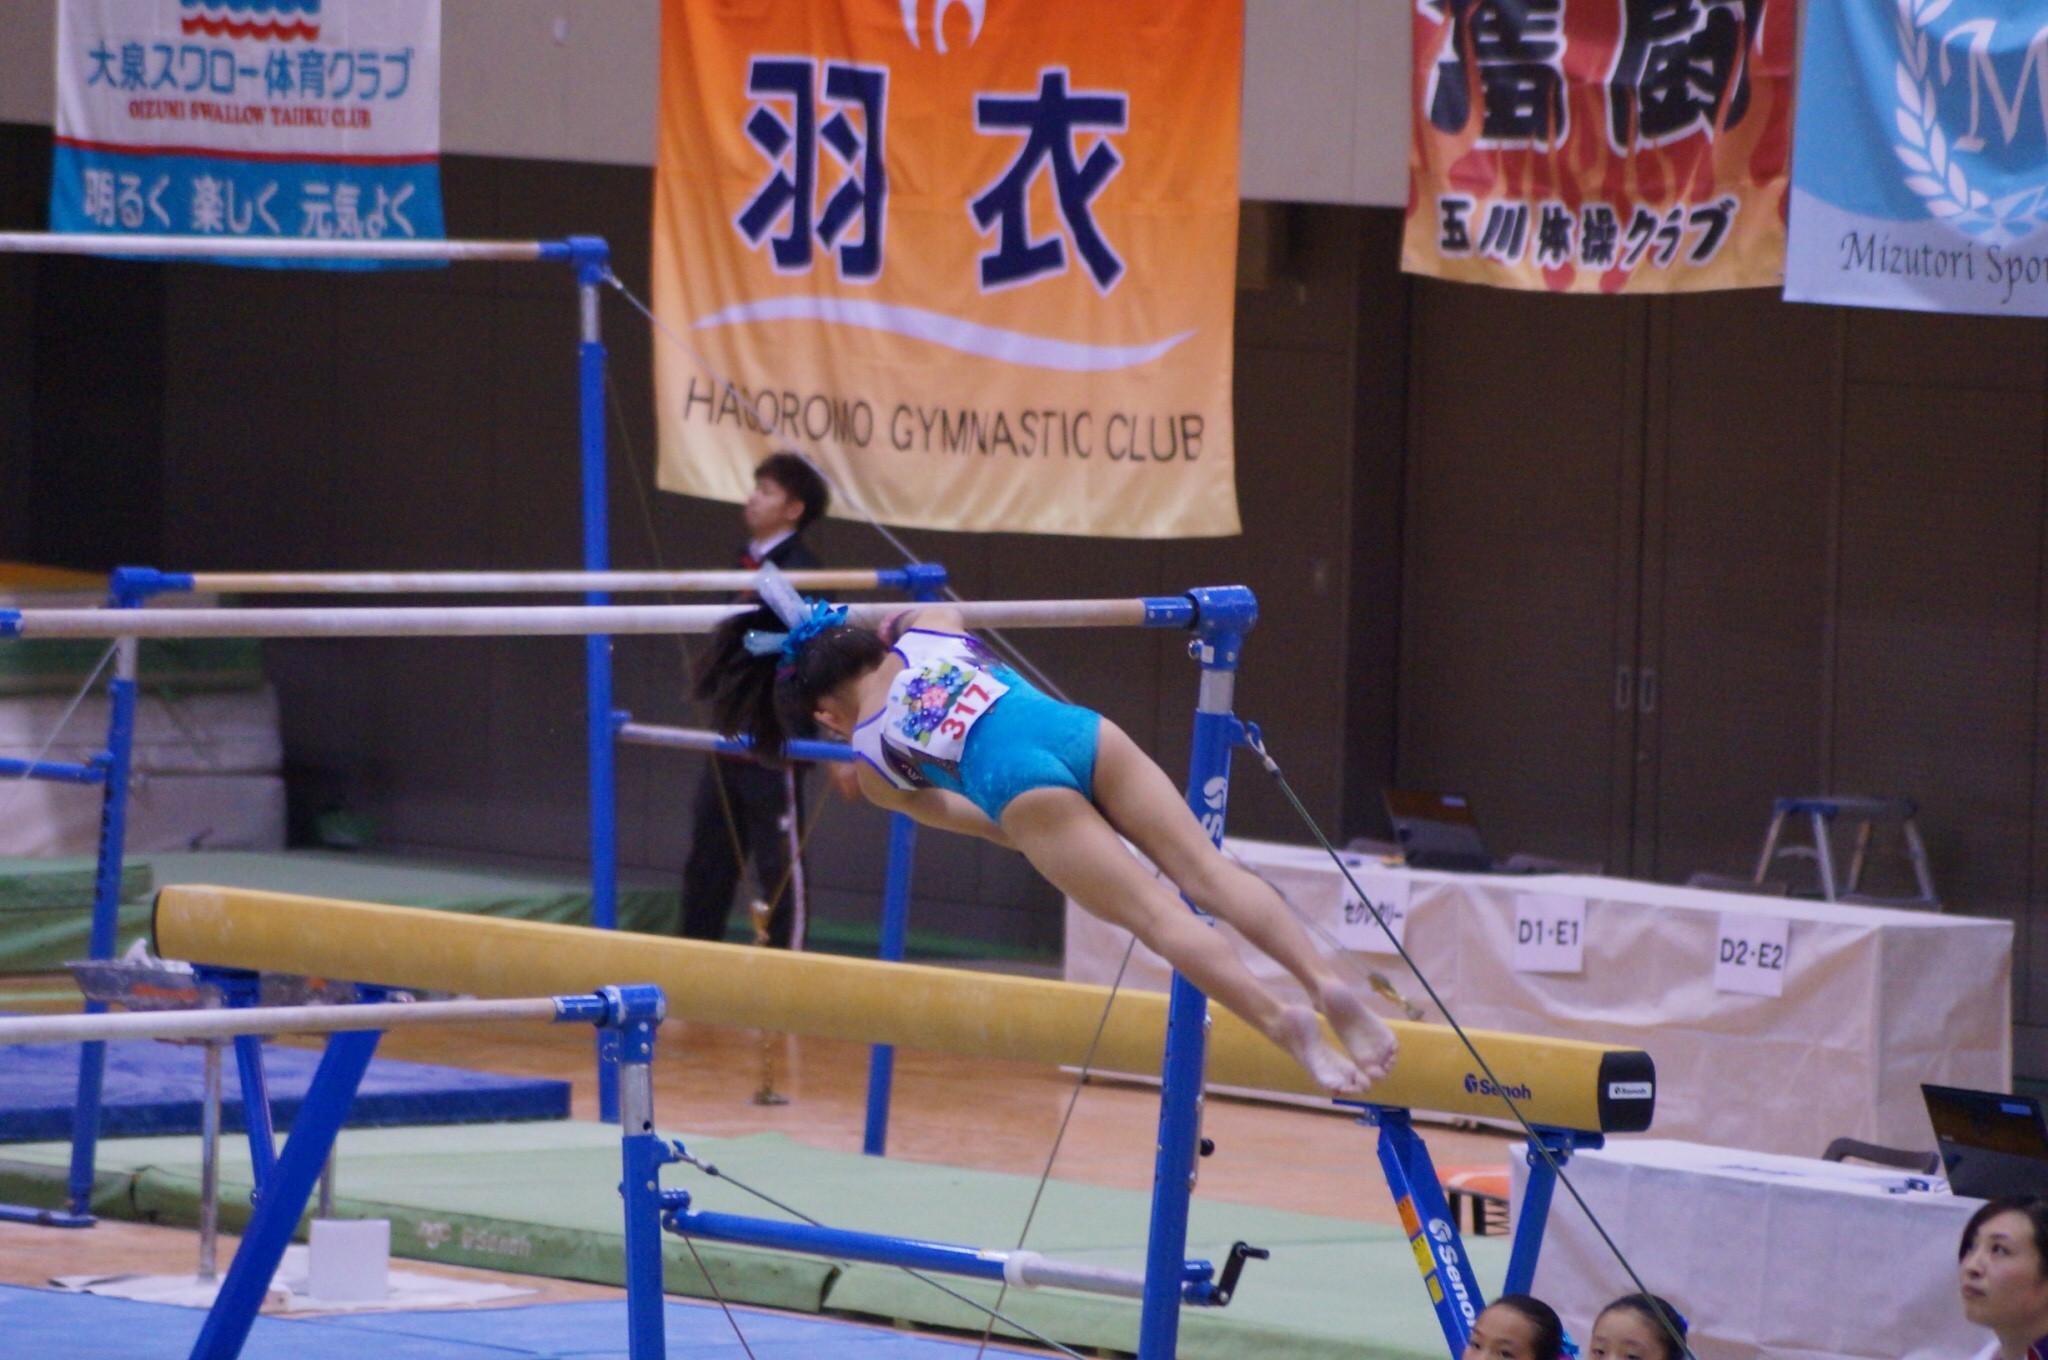 2019年AJG大会in三重県画像31